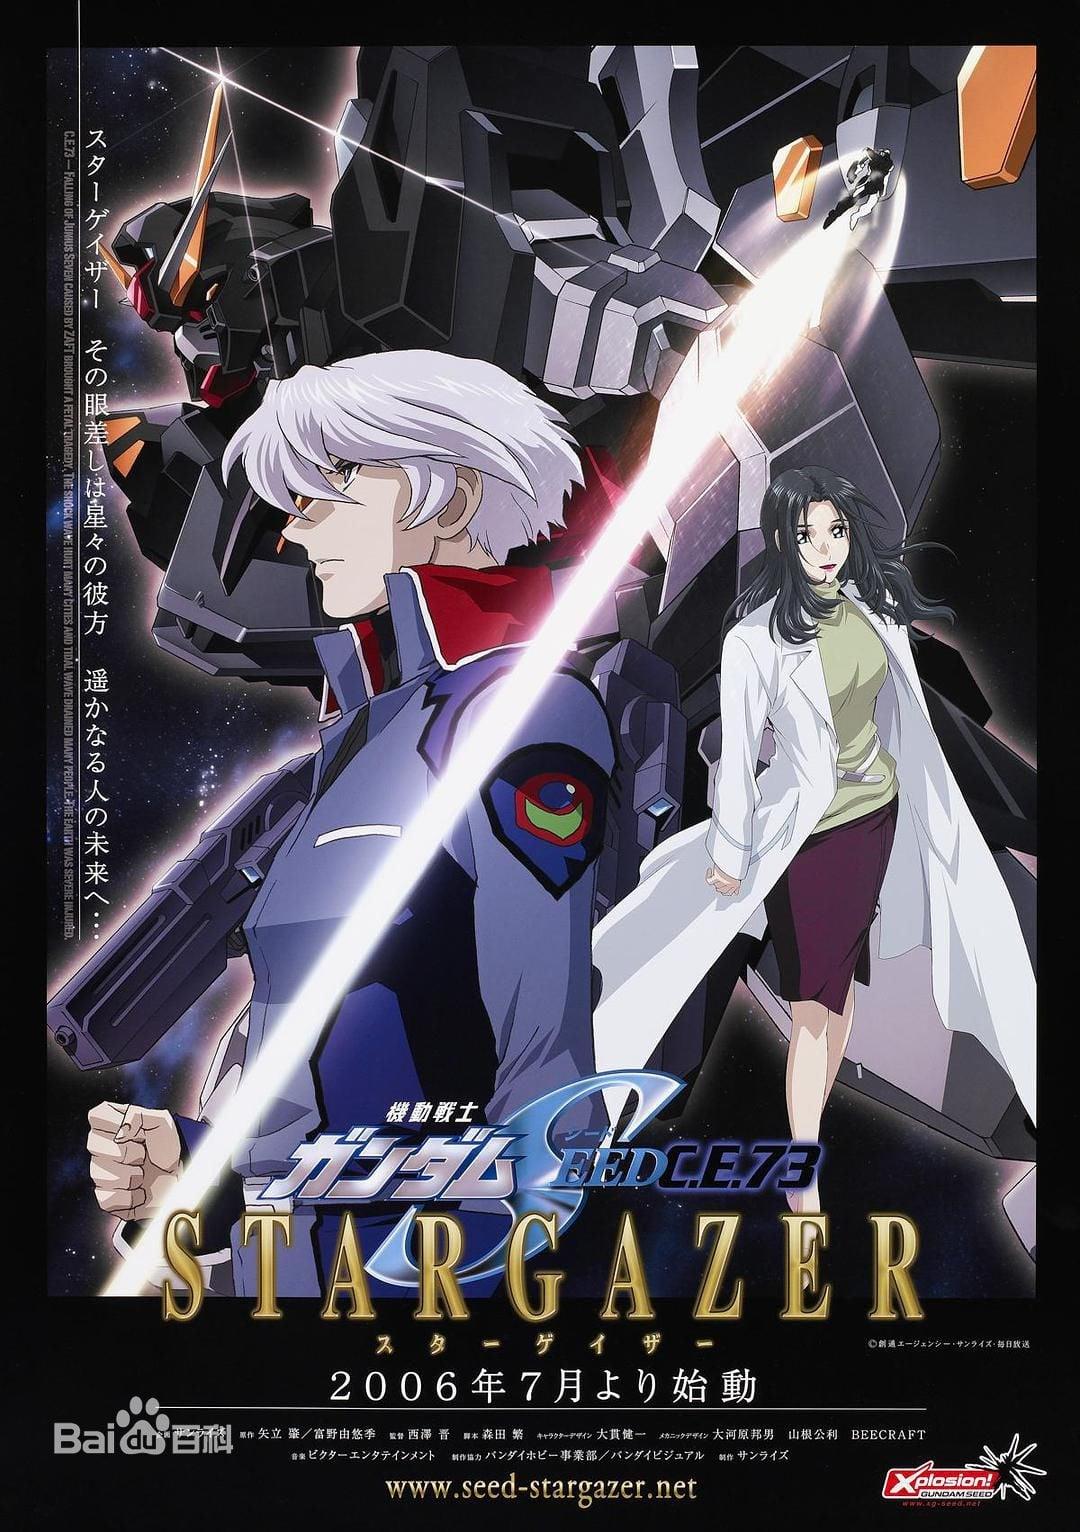 Mobile Suit Gundam SEED C.E. 73: Stargazer (2006)